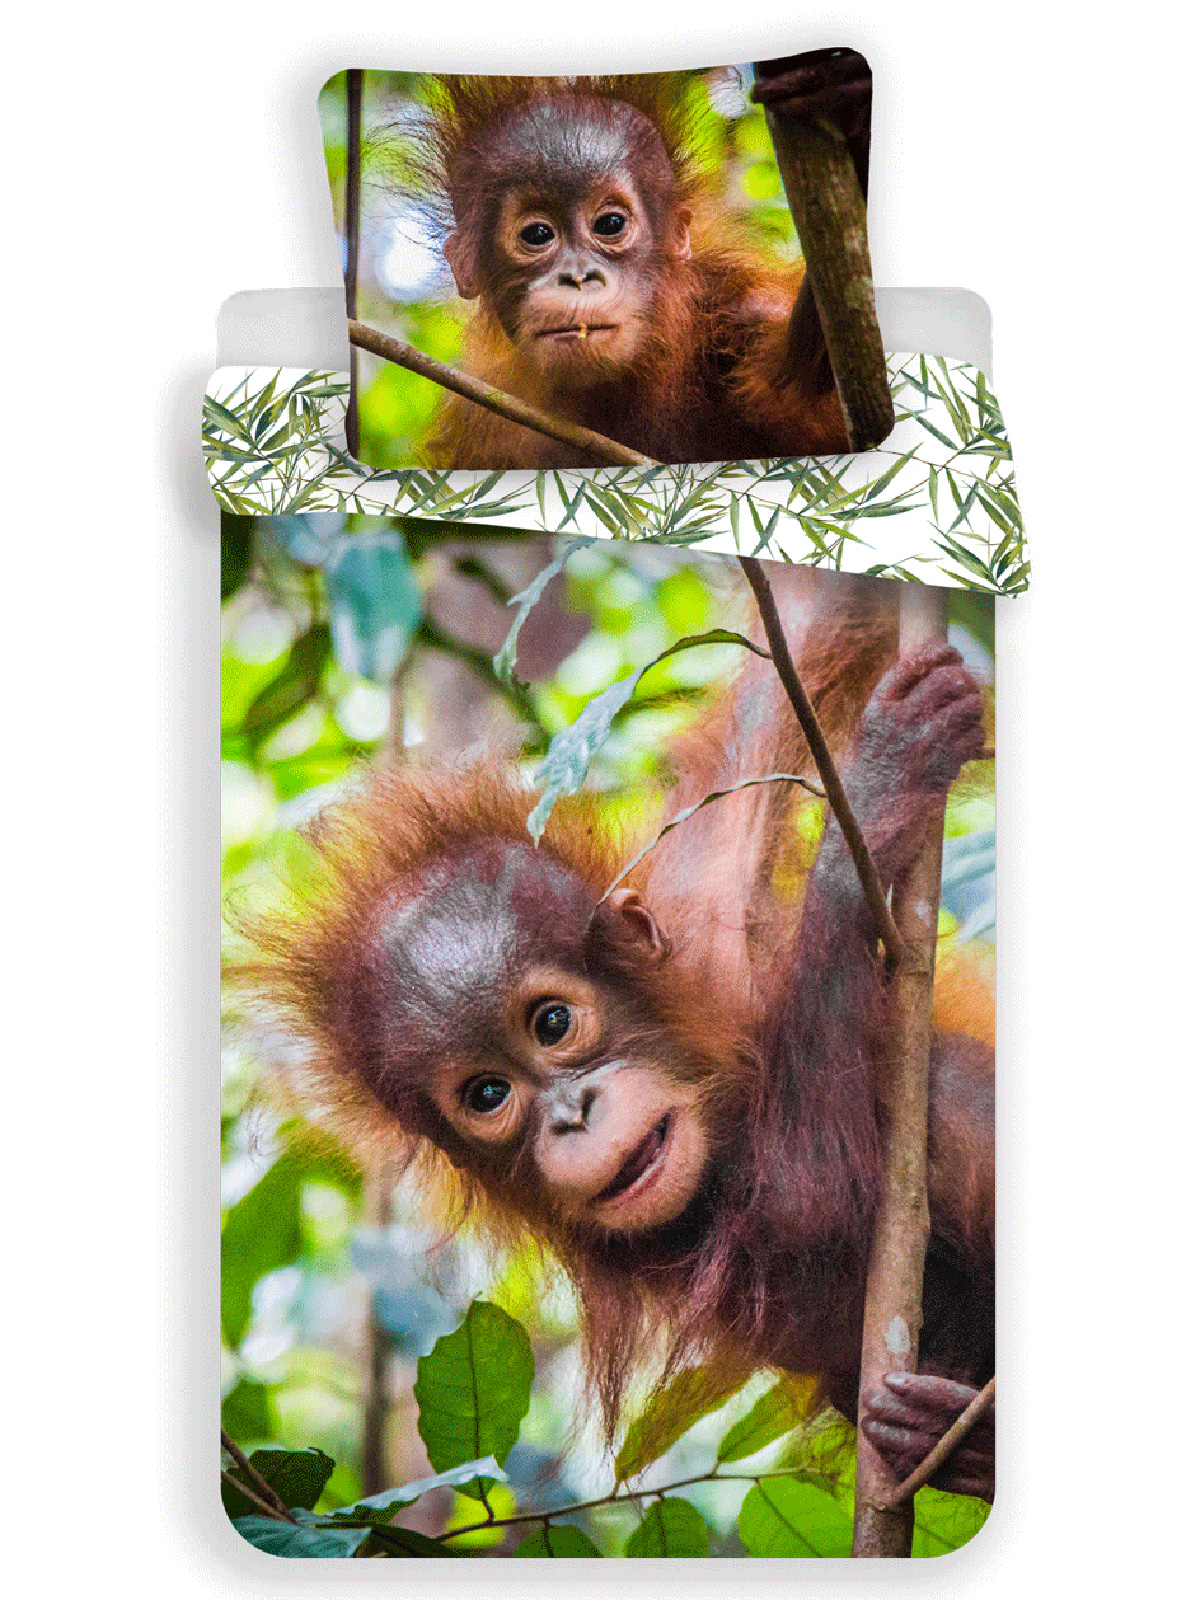 Orangutan 100% Cotton Single Duvet Cover and Pillowcase Set - European